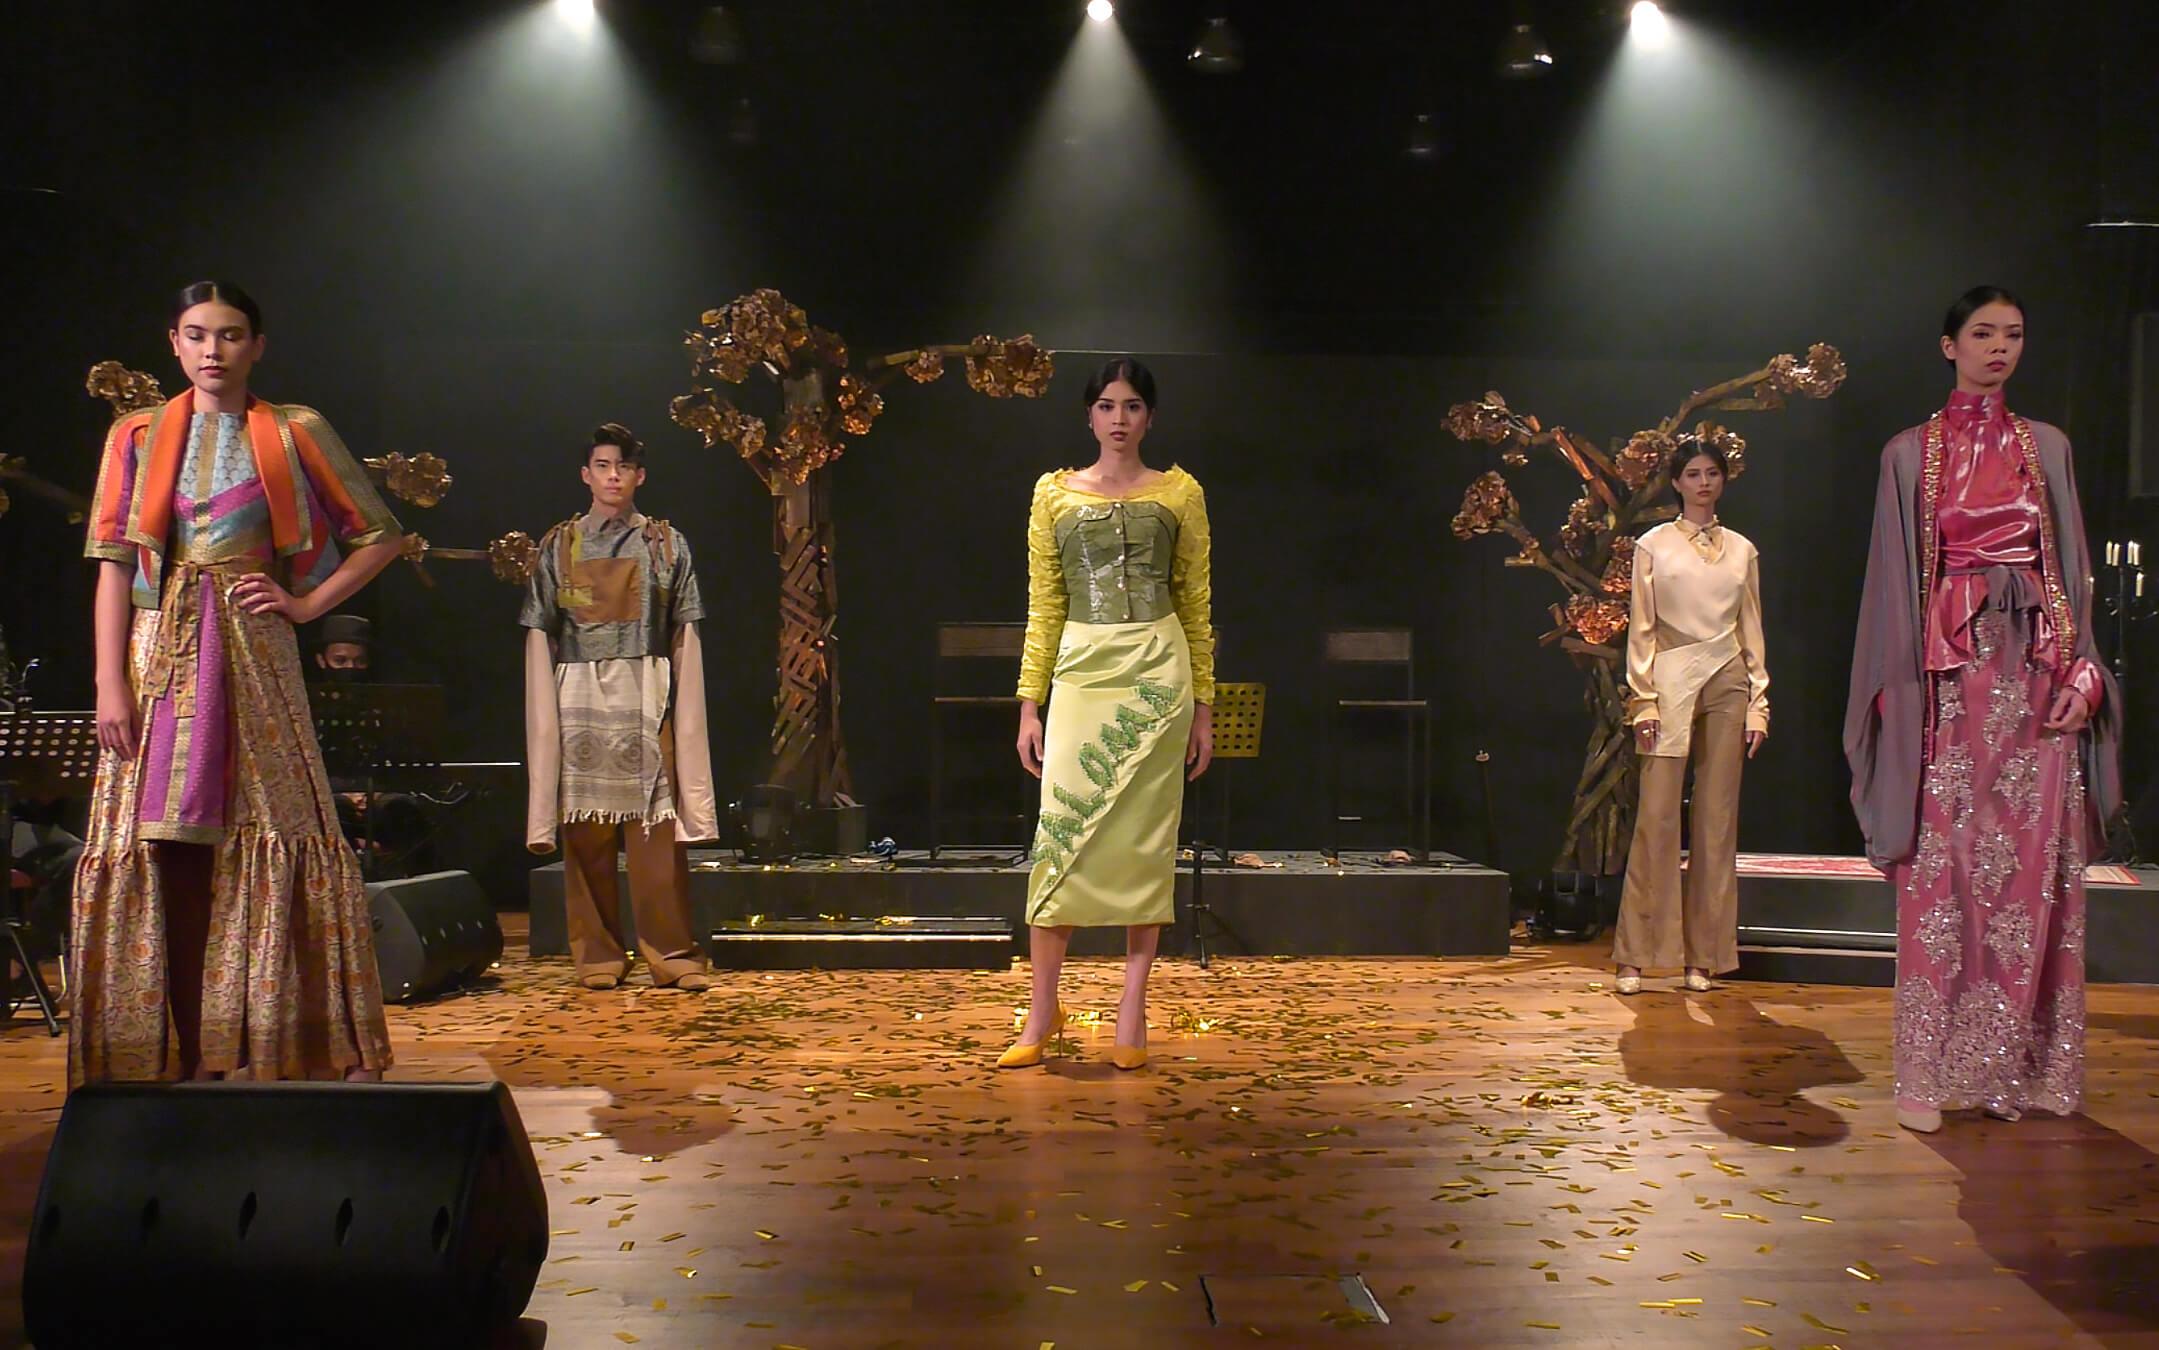 Arab Street URA Raffles Recreating the Textile Culture Collaboration from One Kampung Glam Cahaya Ramadan Live Stream Fashion Show 2